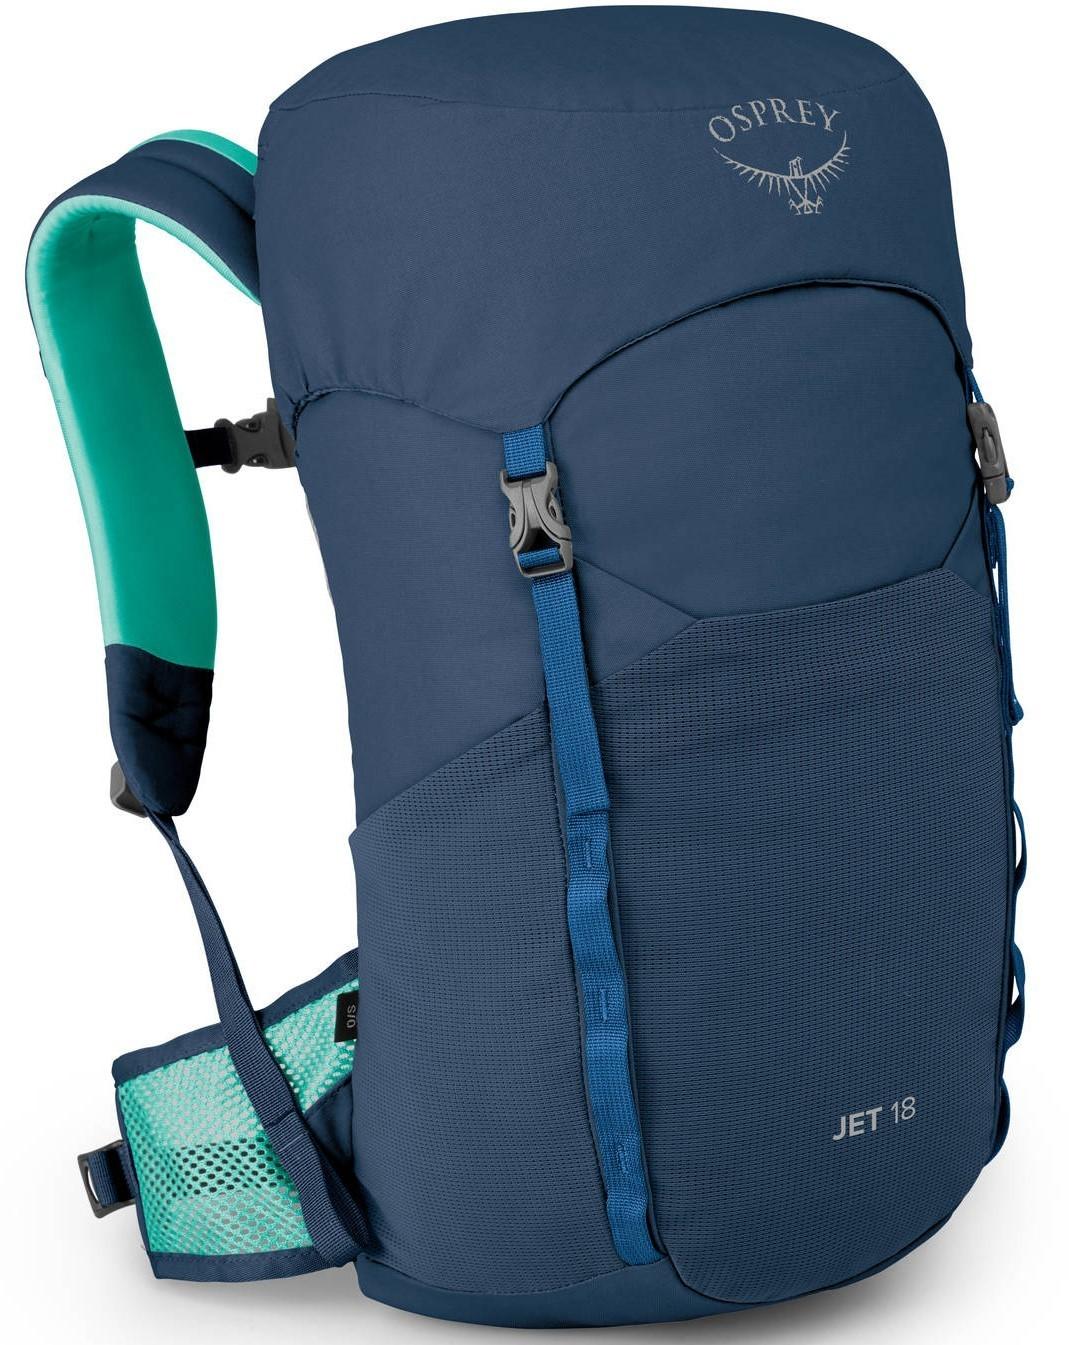 Туристические рюкзаки Рюкзак детский туристический Osprey Jet 18 Wave Blue Jet_18_S20_Side_Wave_Blue_web.jpg